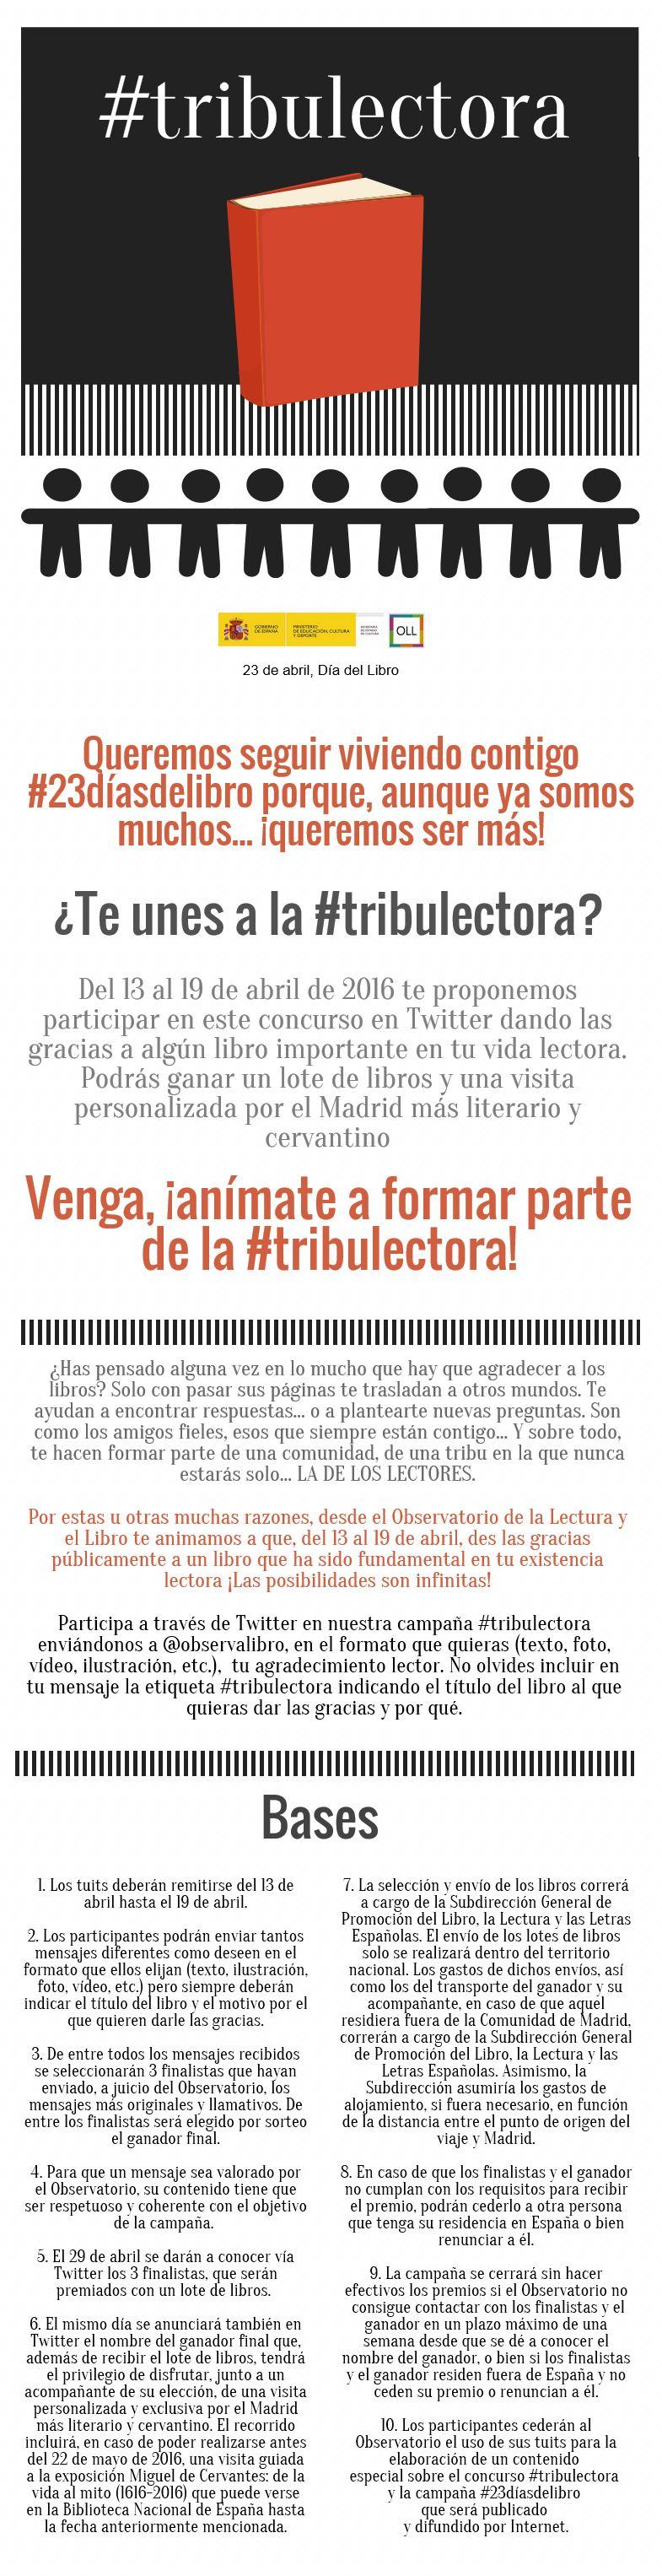 Bases #tribulectora